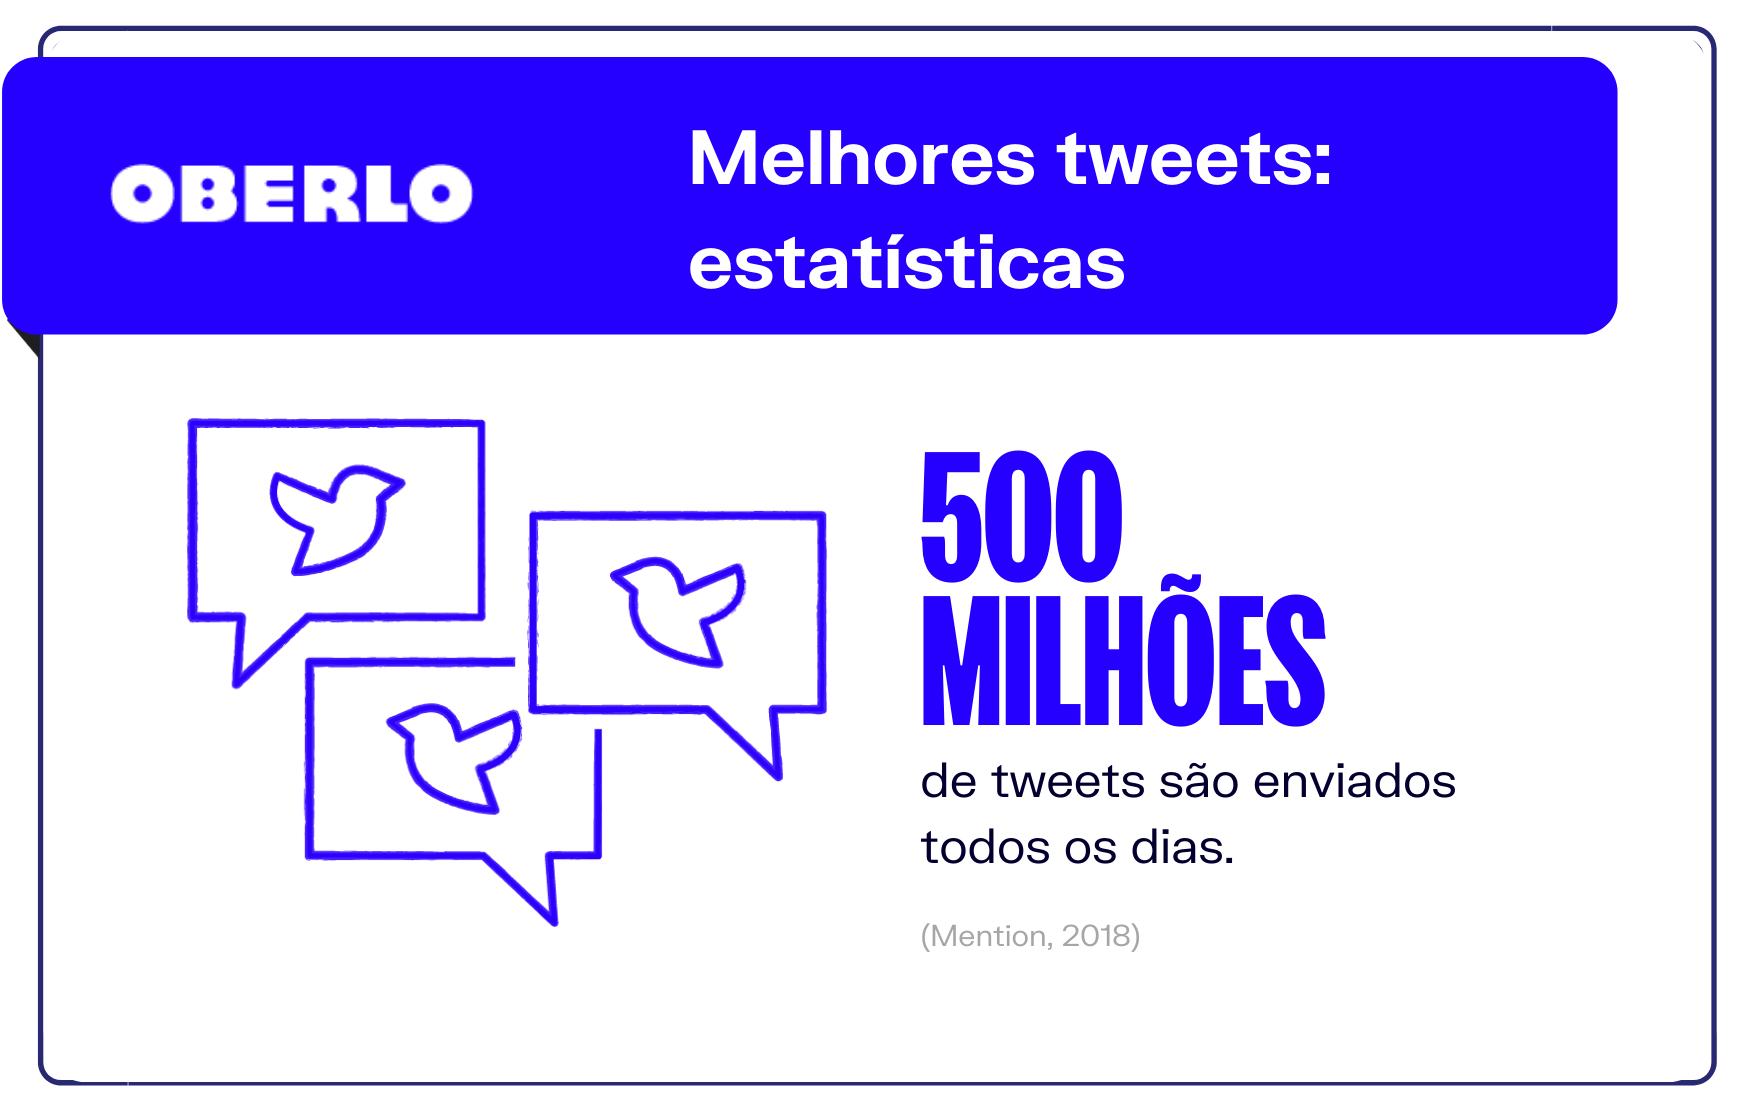 Melhores tweets: estatísticas Twitter